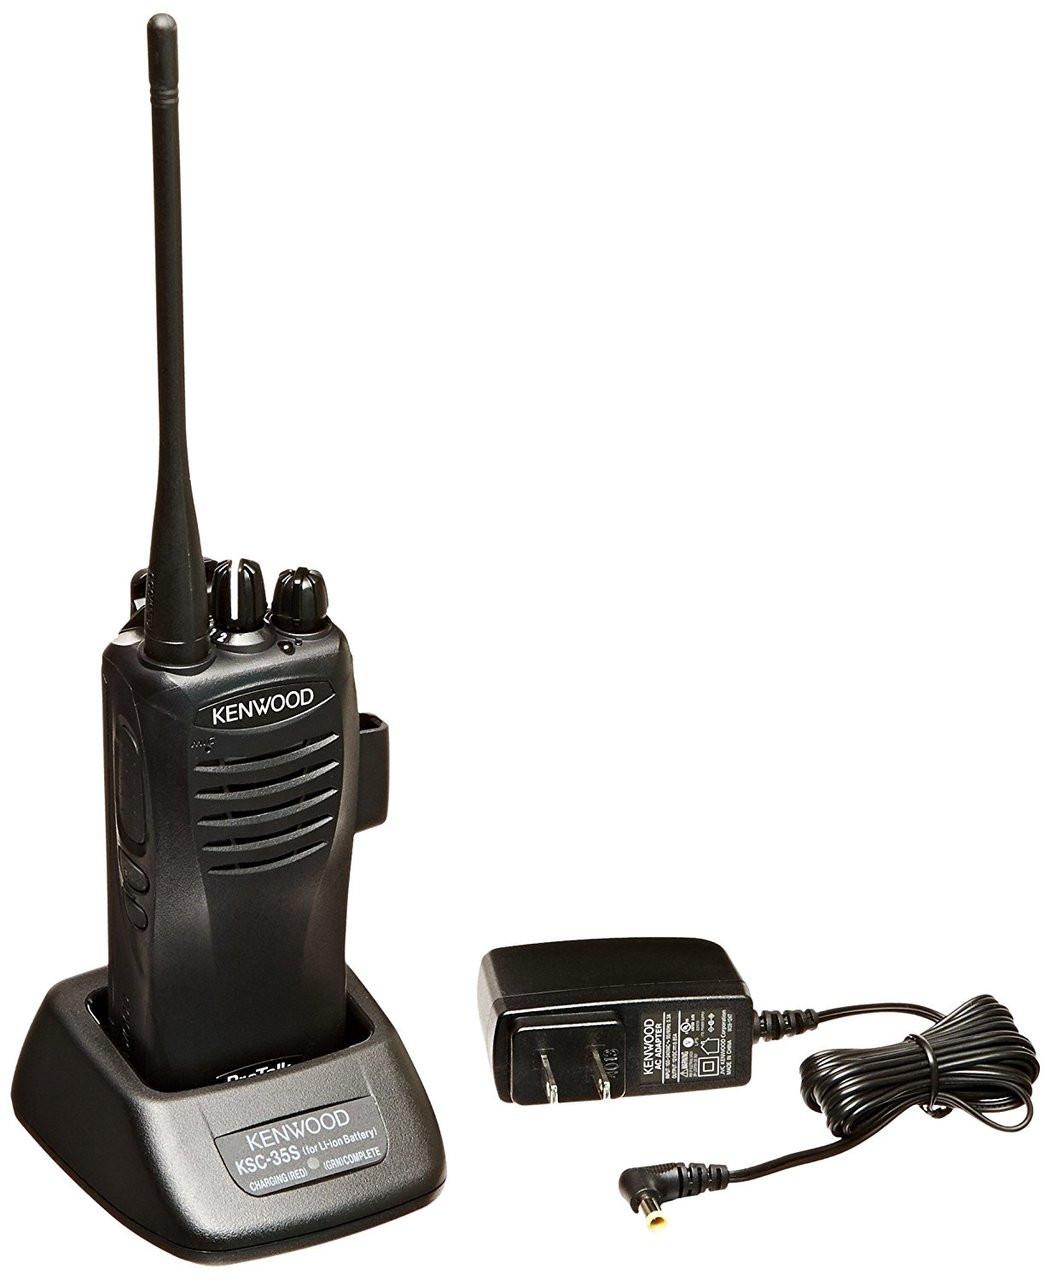 Kenwood TK2402V16P 5 Watt 16 Channel VHF Two Way Radio